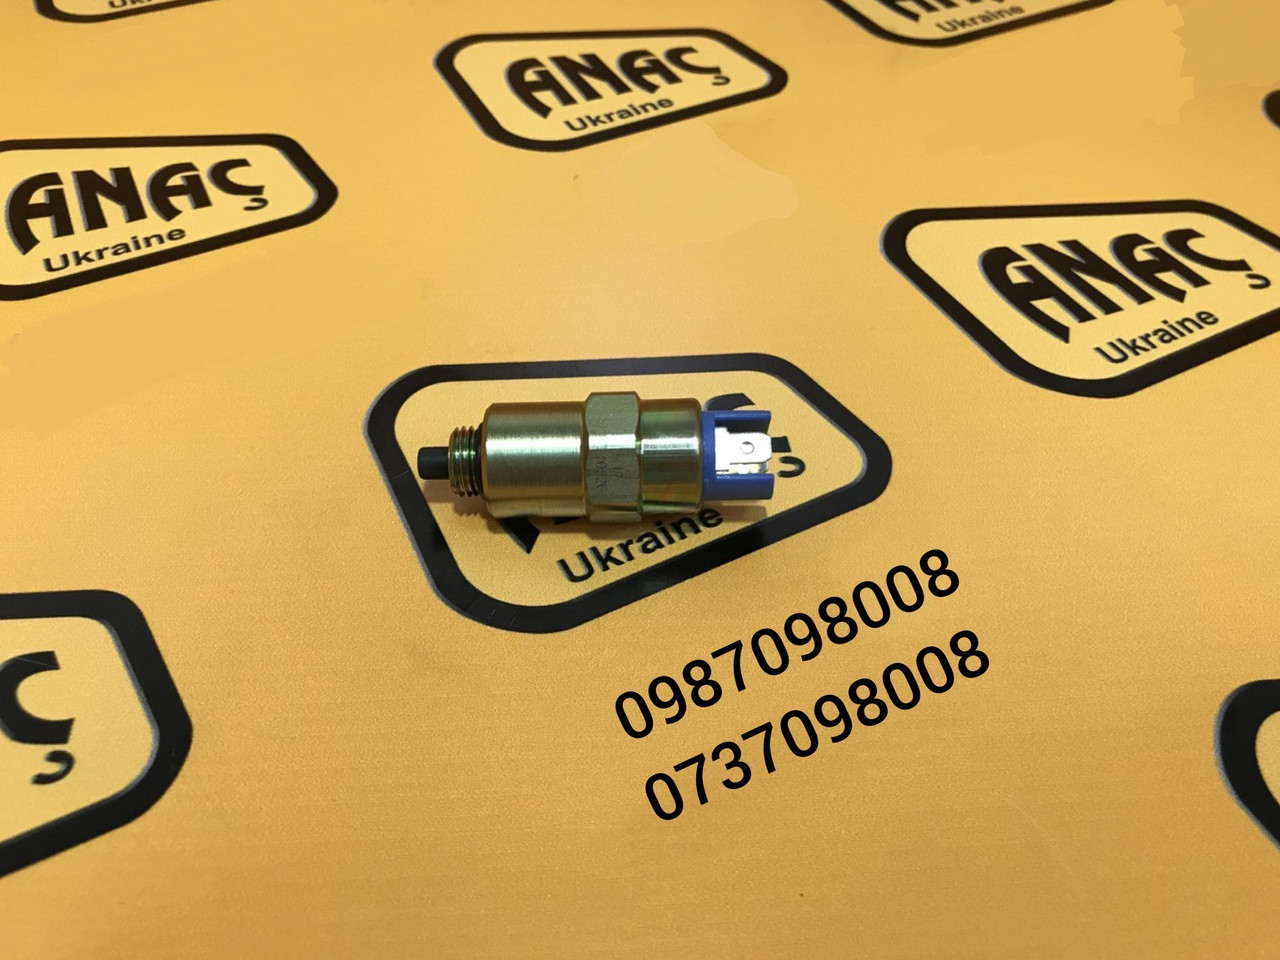 Клапан отсечки топлива (соленоид) для двигателя на JCB 3CX, 4CX , каталожный номер : 17/105201, 716/30098